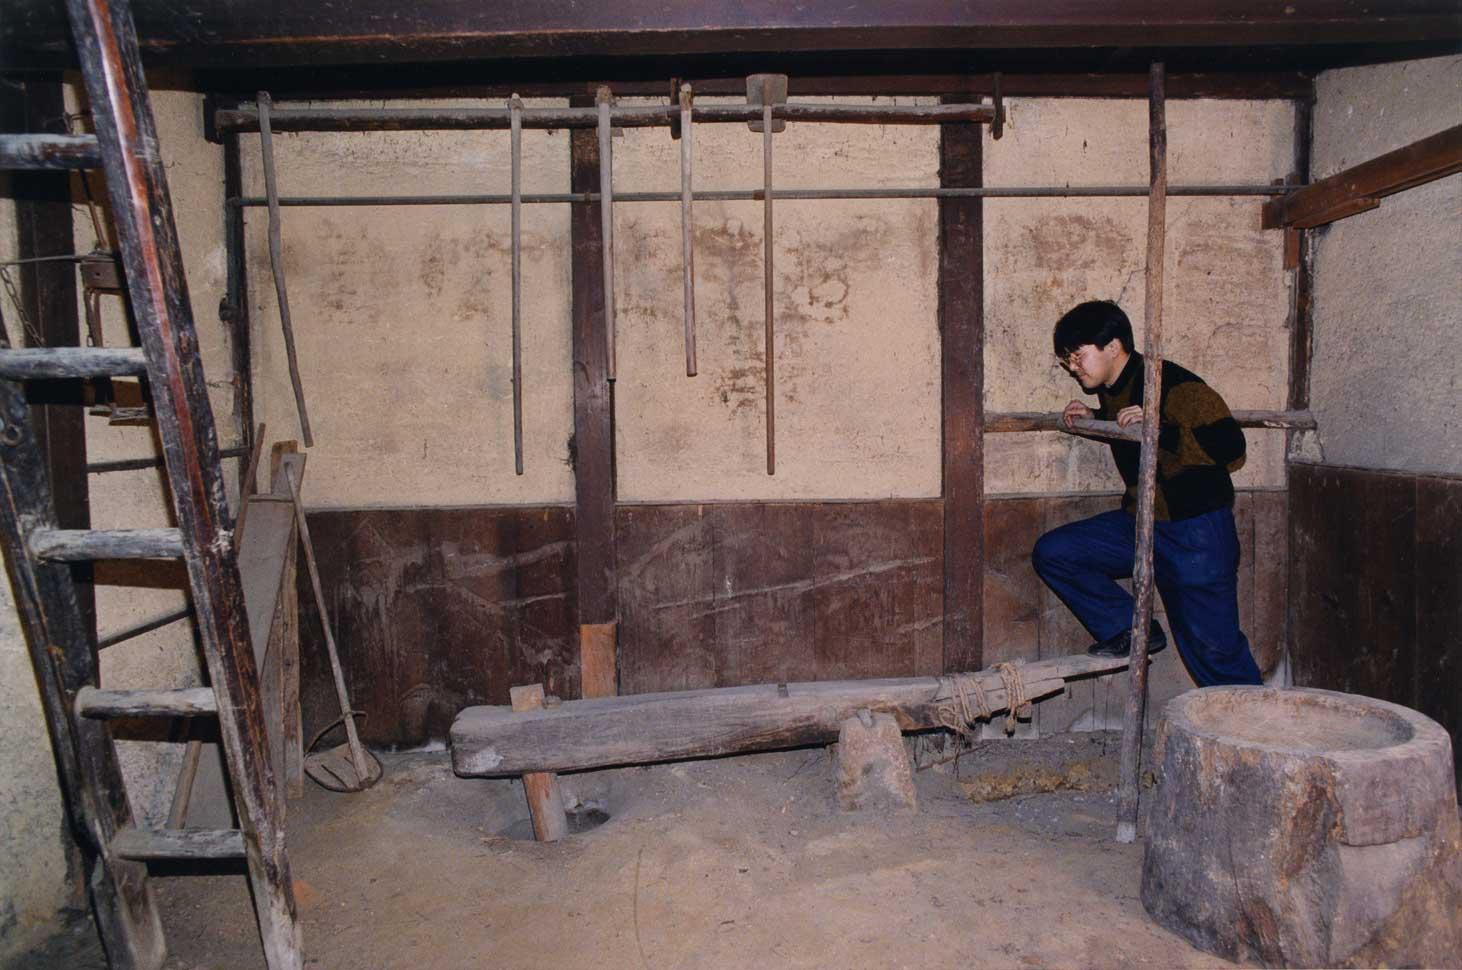 <p>畑田家住宅納屋</p>屋敷地の西側に建つ平屋建の納屋で、桟瓦葺の切妻屋根は両端部のみ3筋分押さえの丸瓦を葺く。外壁は軒下は真壁であるが、内法部分を塗込とし腰板を貼る。東面の開口部は、板戸4枚を1本溝引分として大きく開く。旧家の屋敷構を構成する遺構の一つである。